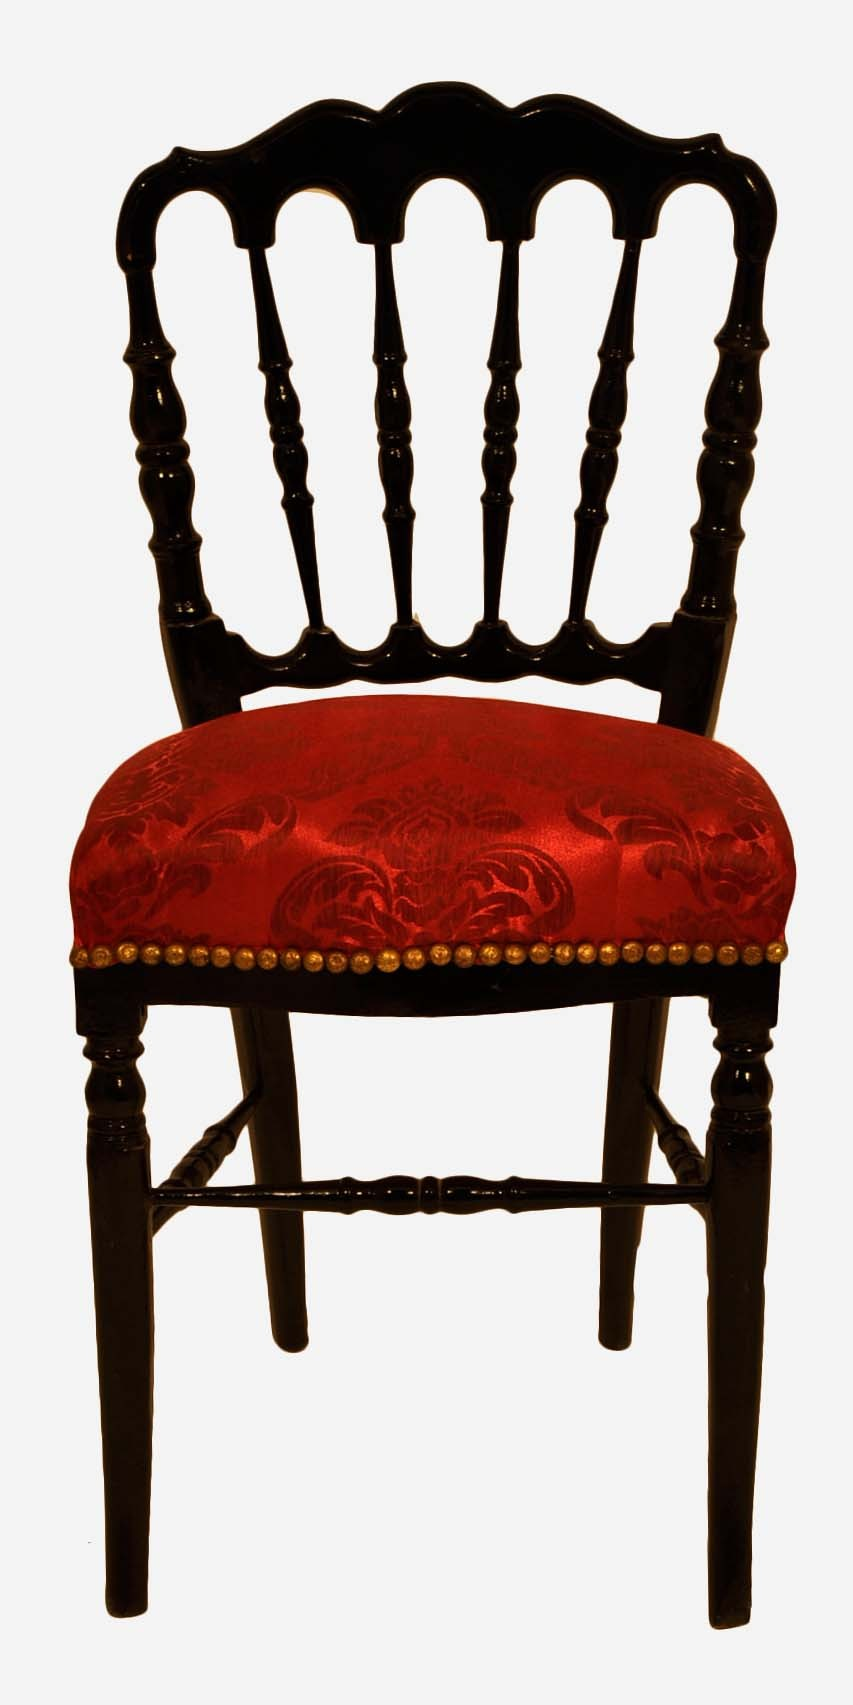 chaise de style napoleon iii avec tissu en damas rouge